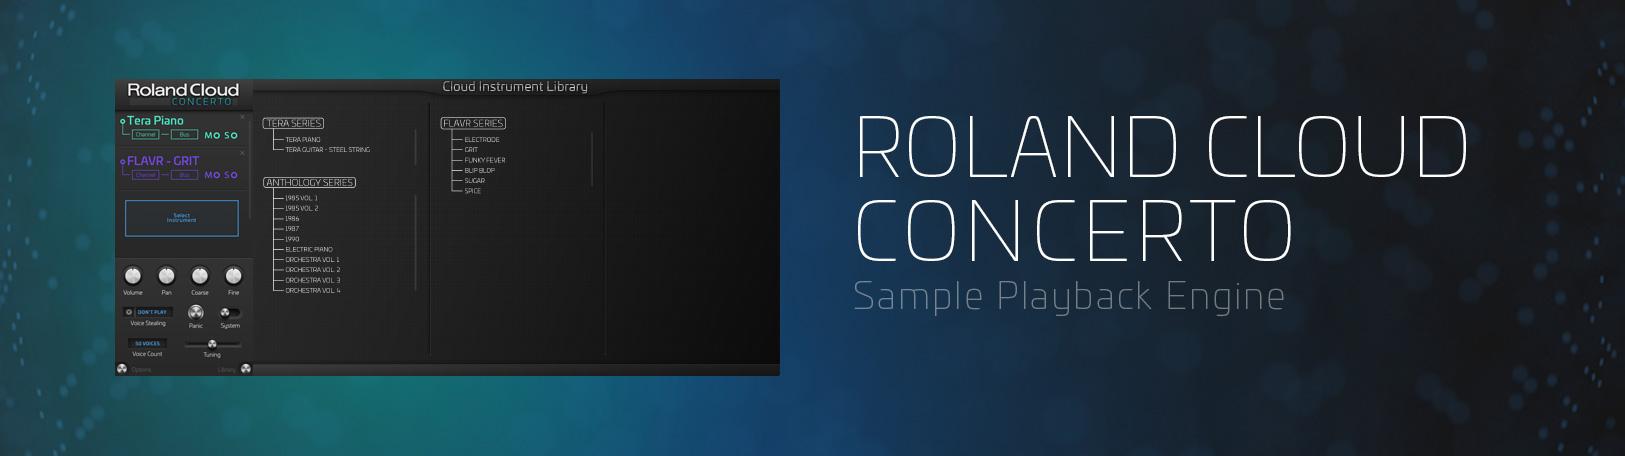 roland cloud concerto manual